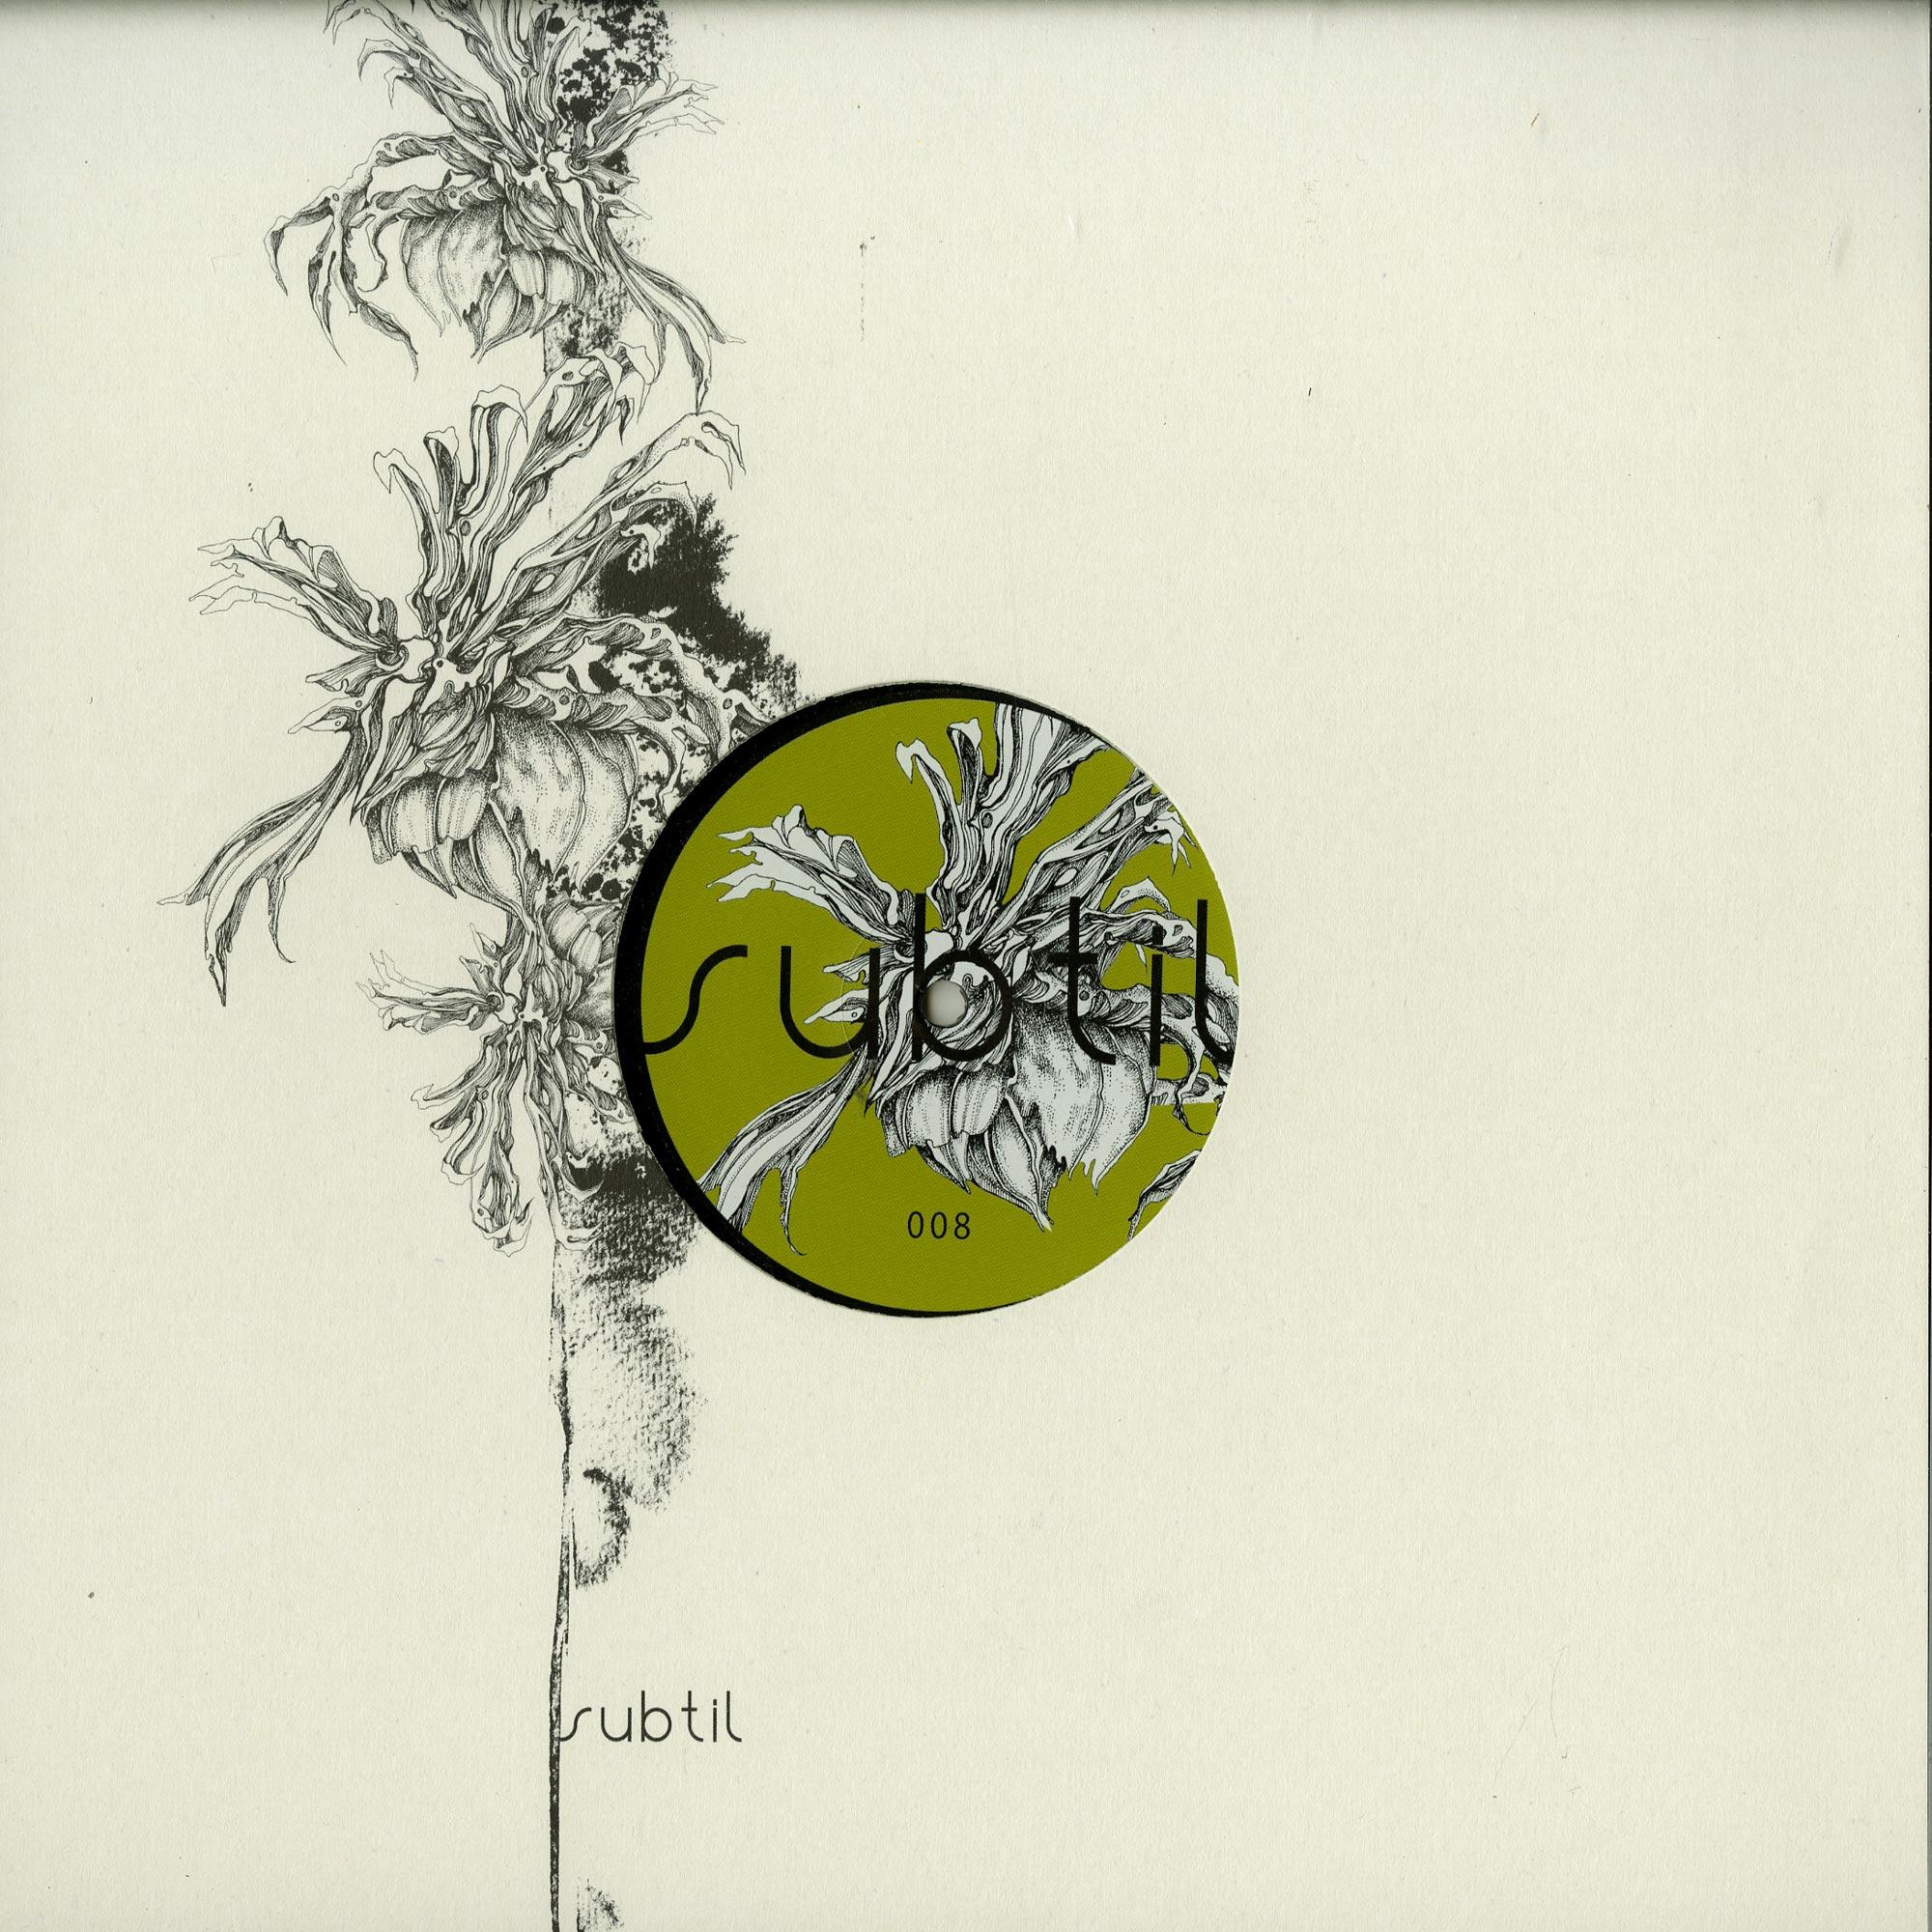 Cosmjn - VIBR8 EP